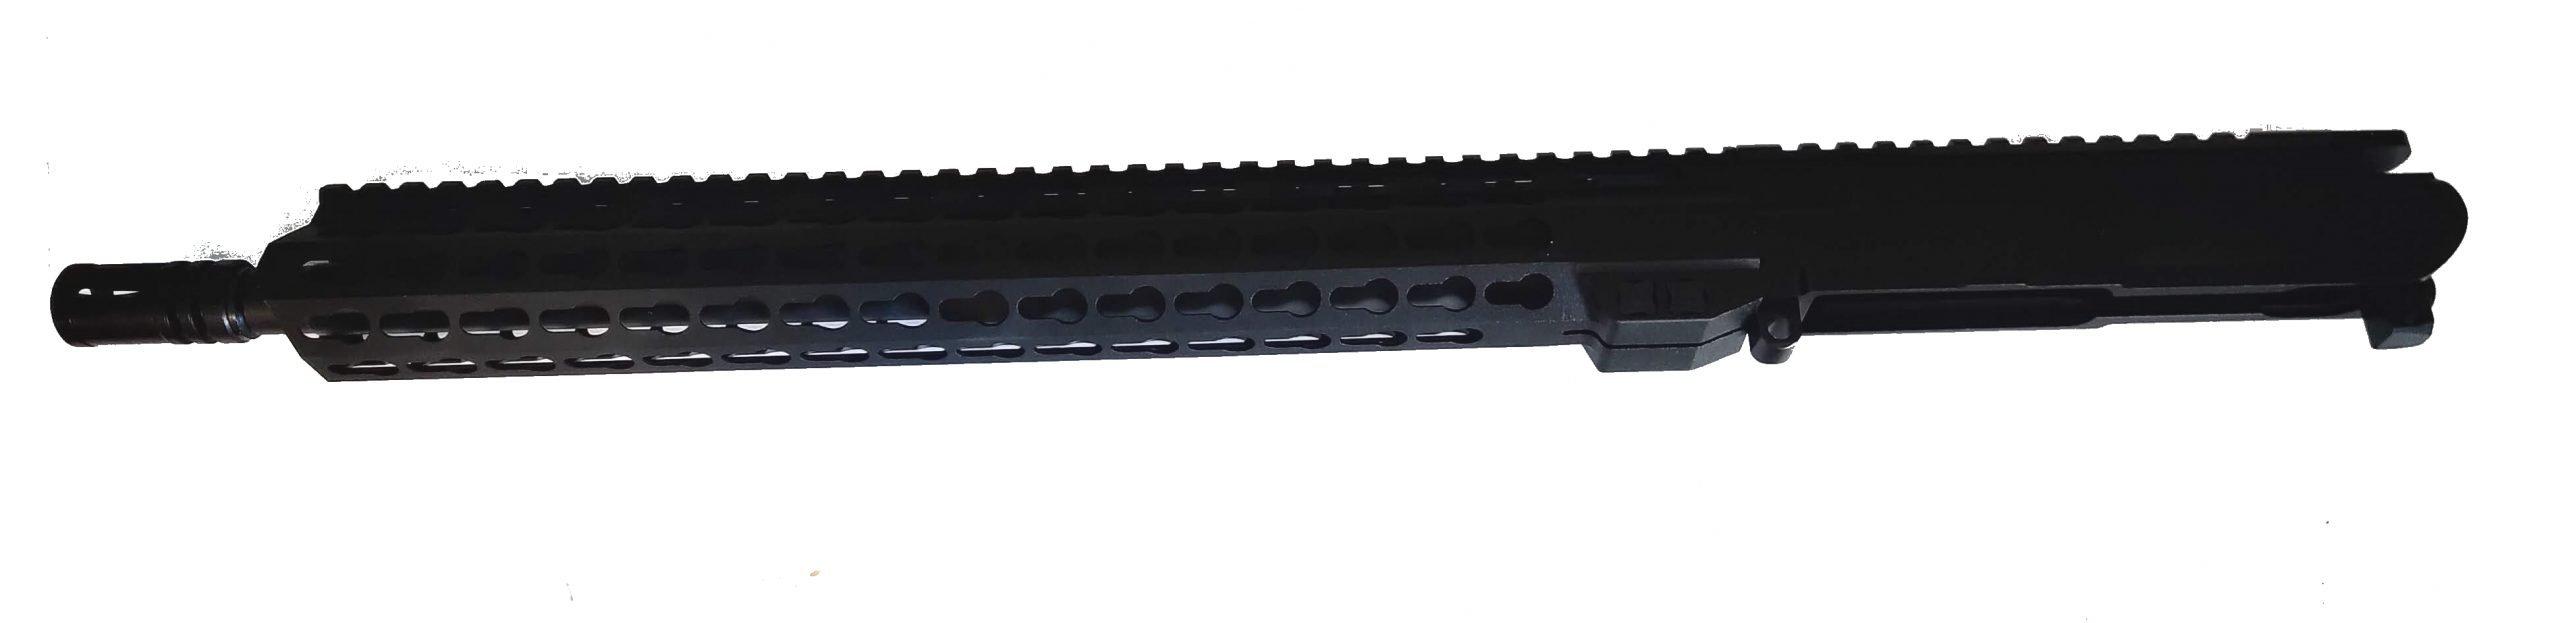 "16"" carbine upper keymod rail"